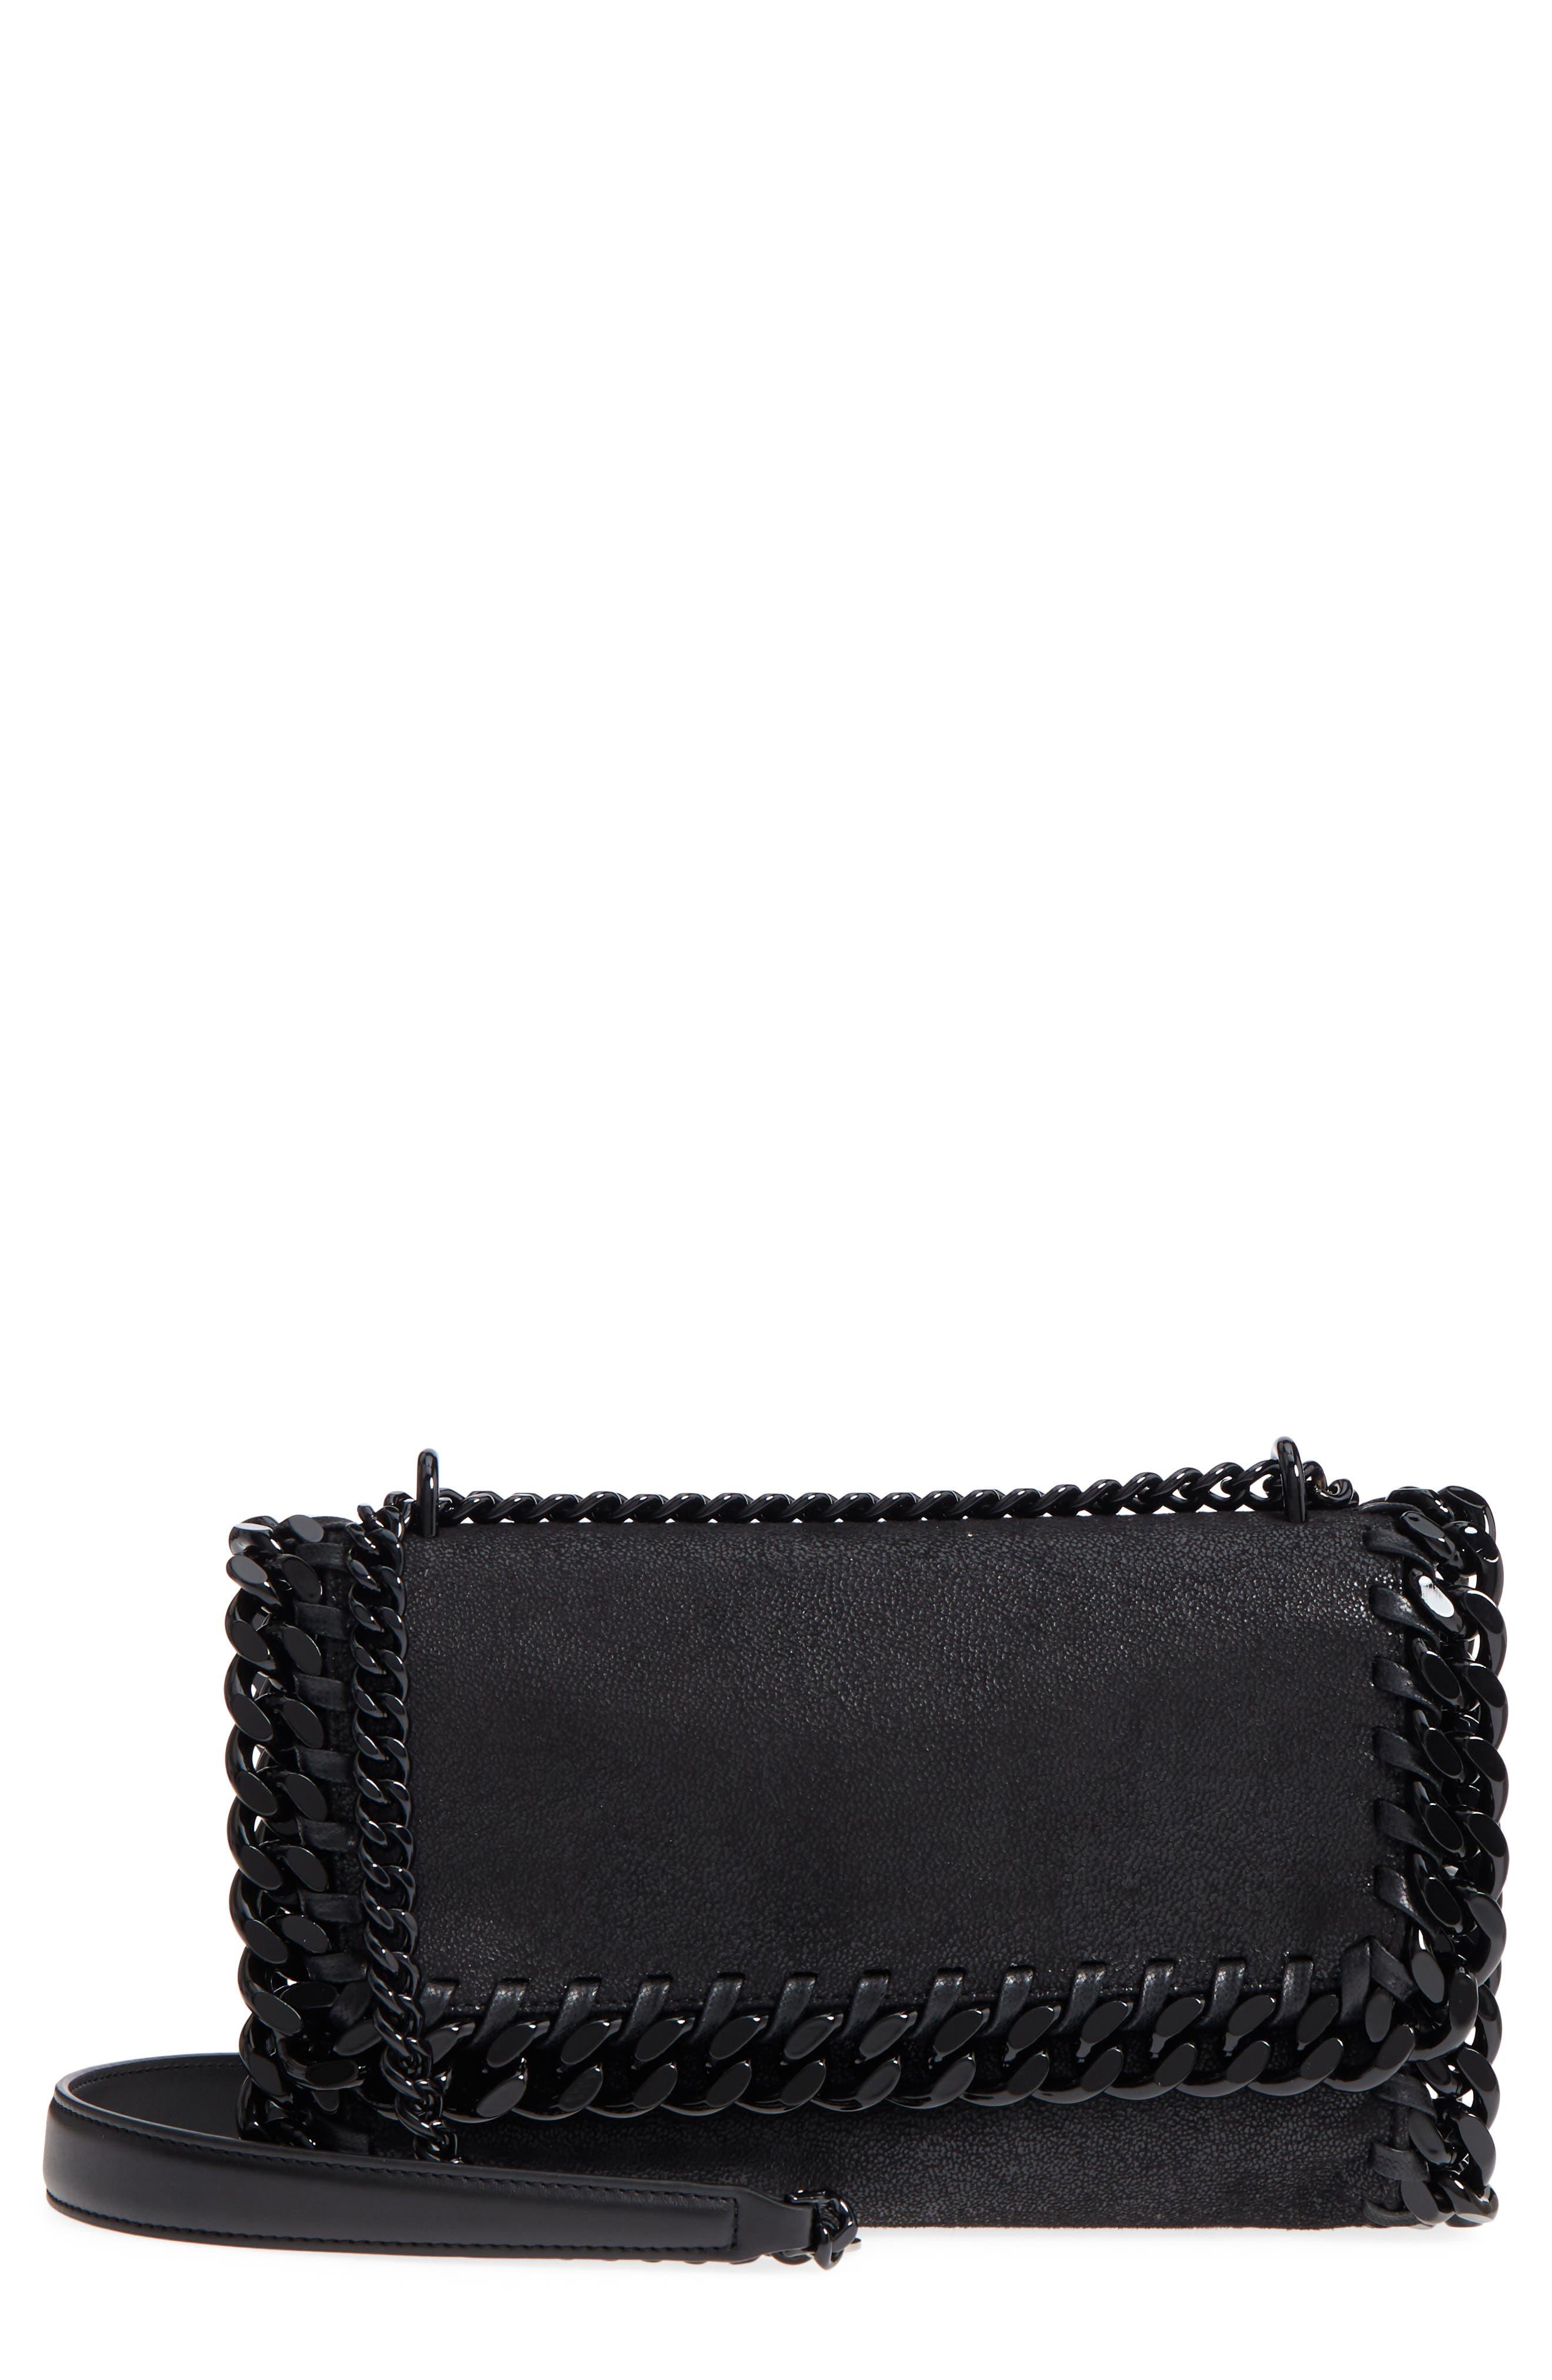 Falabella Shaggy Deer Faux Leather Shoulder Bag,                         Main,                         color, 001